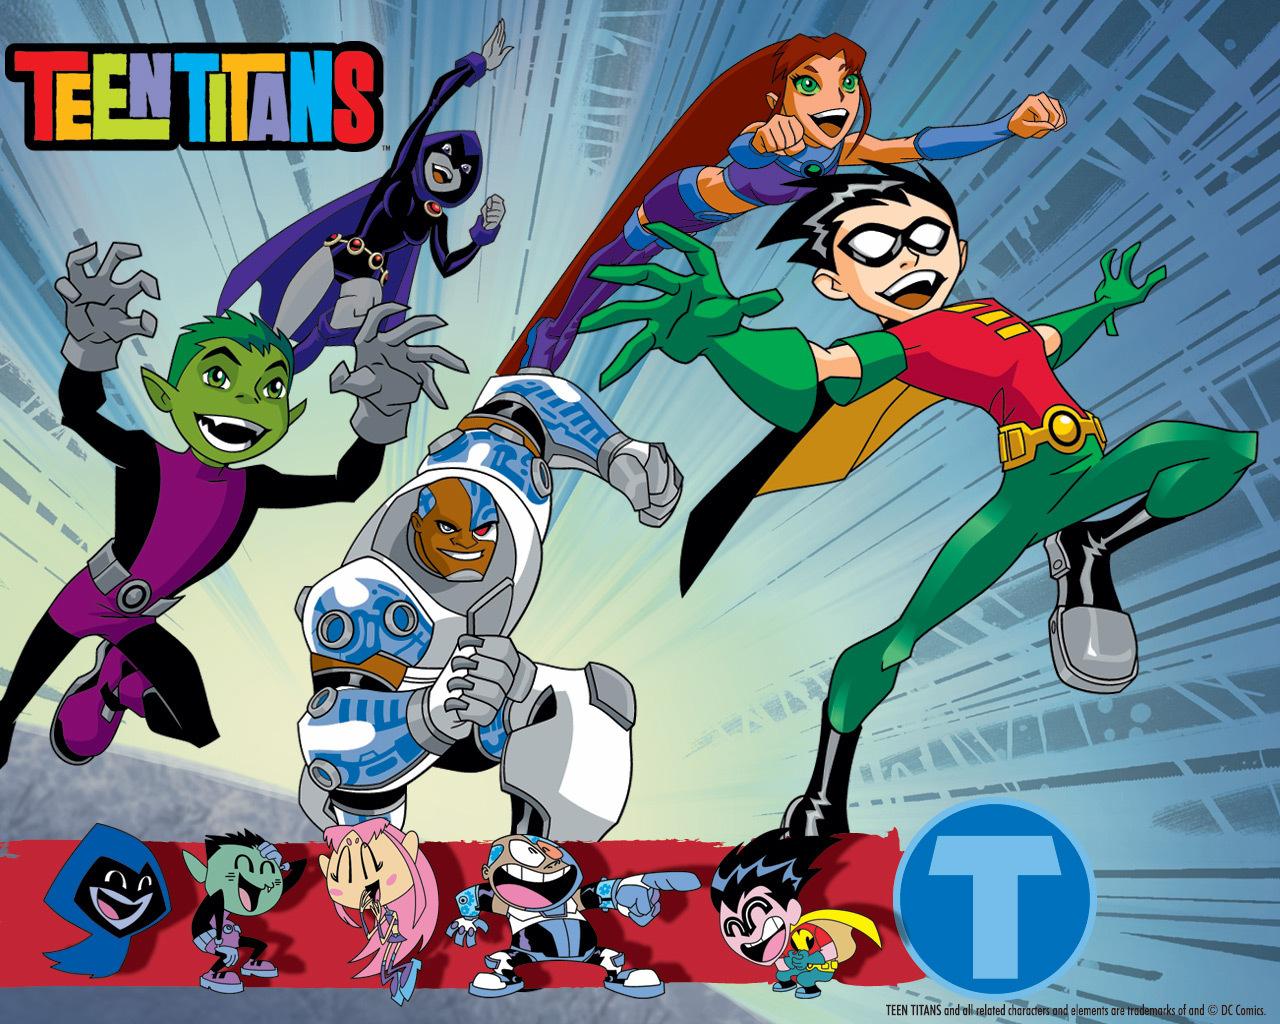 Papel De Parede Hd Wallpapers Teen Titans Papeis De